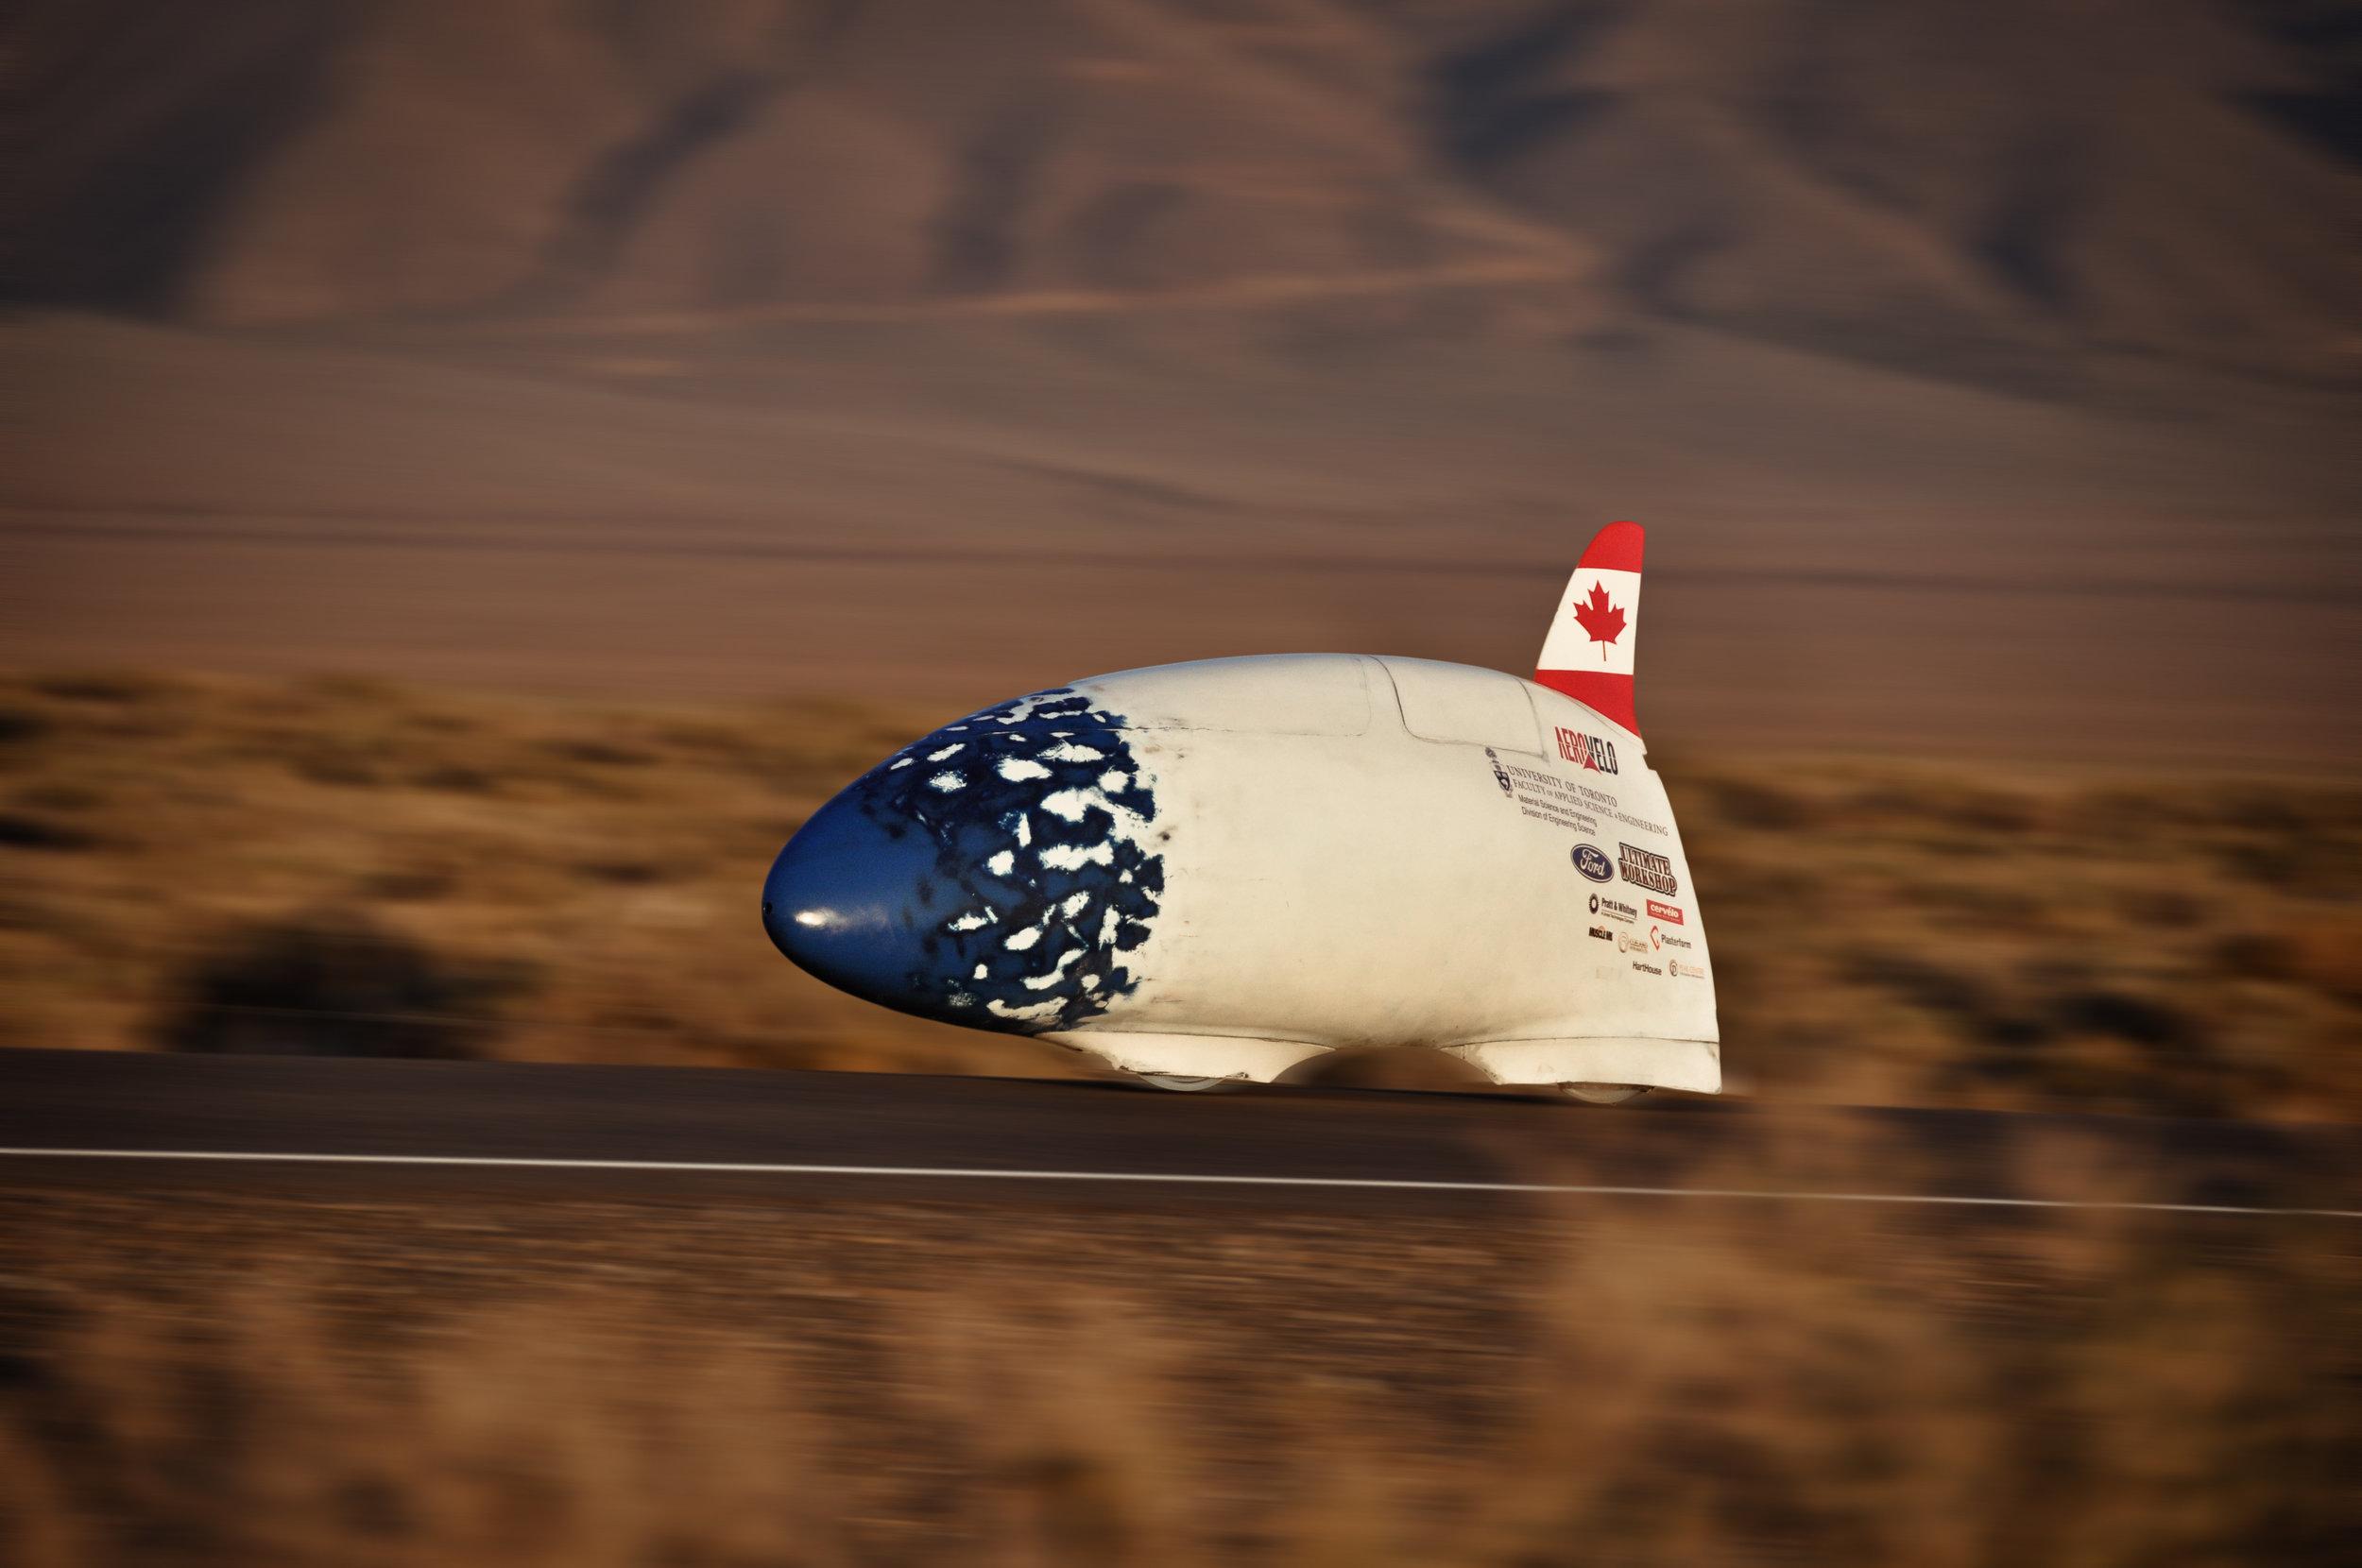 Bluenose (2012-2013) Top Speed: 125.02 km/hr